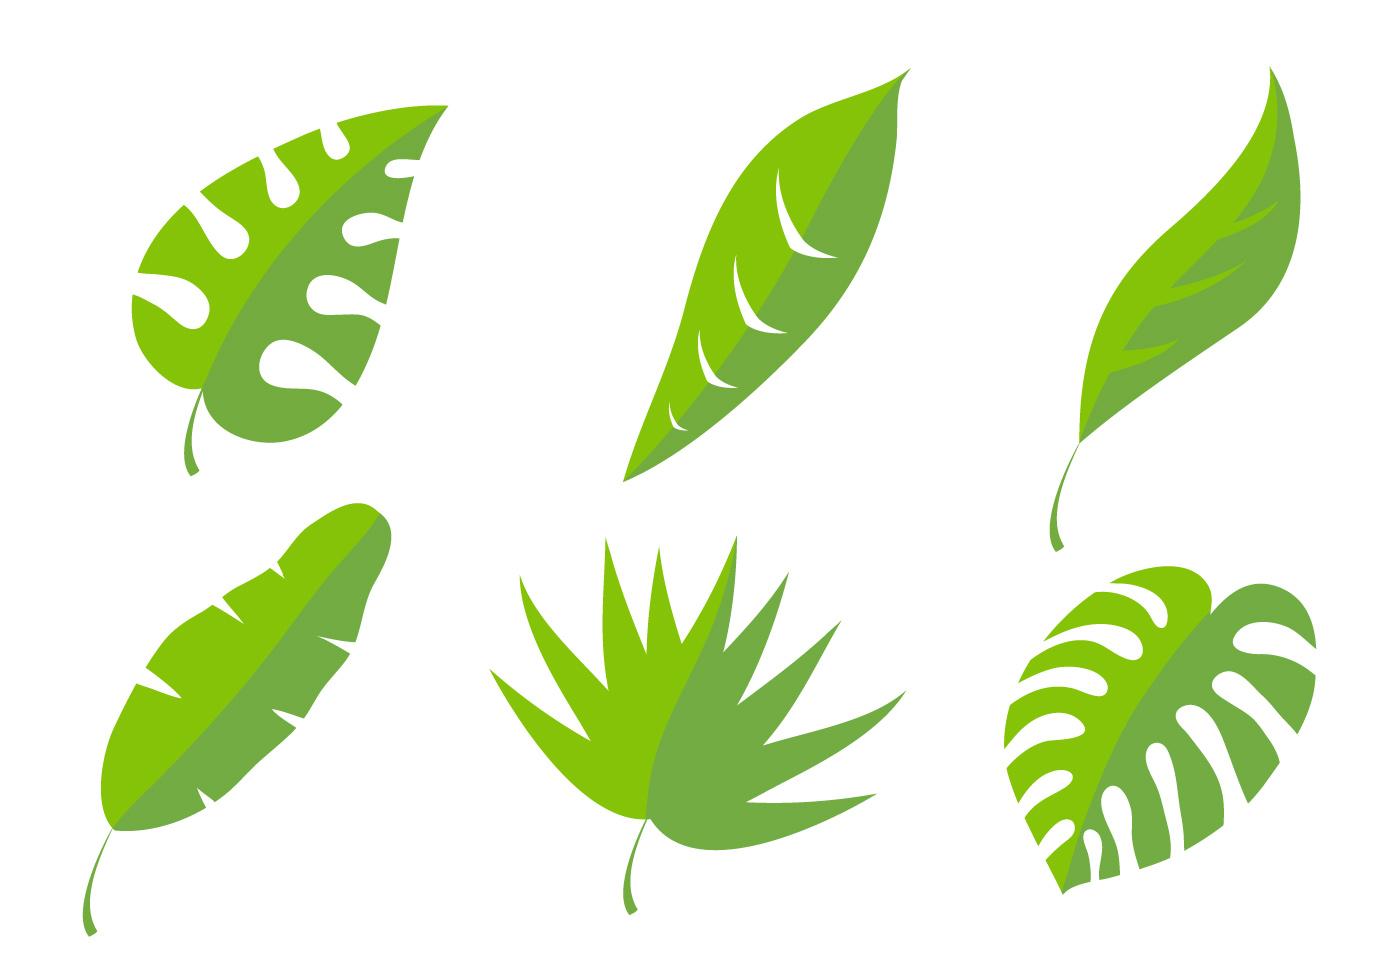 palm leaf vectors download free vector art stock graphics images rh vecteezy com leaf vector image leaf vector icon